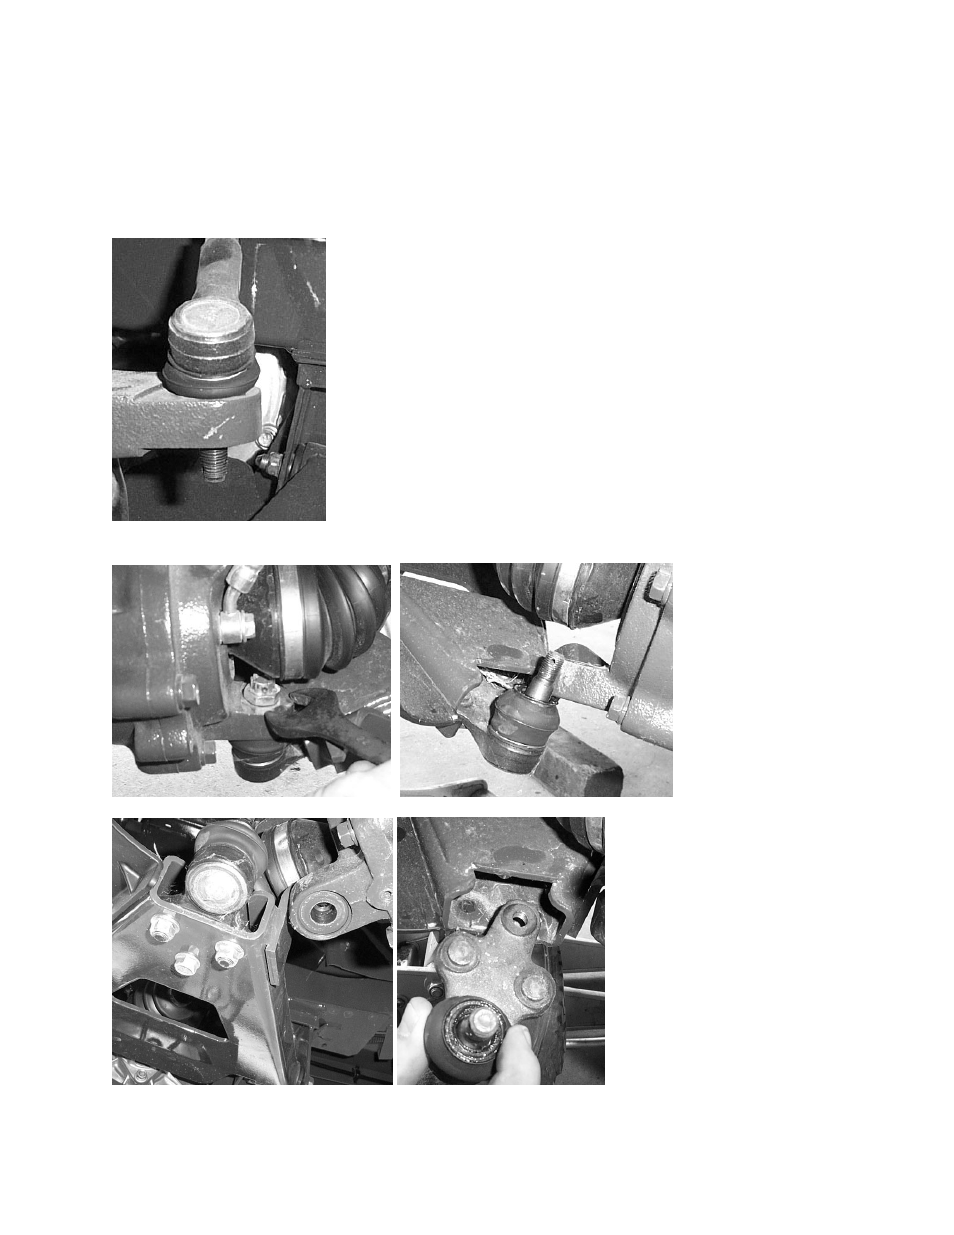 kubota rtv 1140 cpx wiring diagram front lift installation high lifter lift kit for kubota rtv 1140  lift kit for kubota rtv 1140